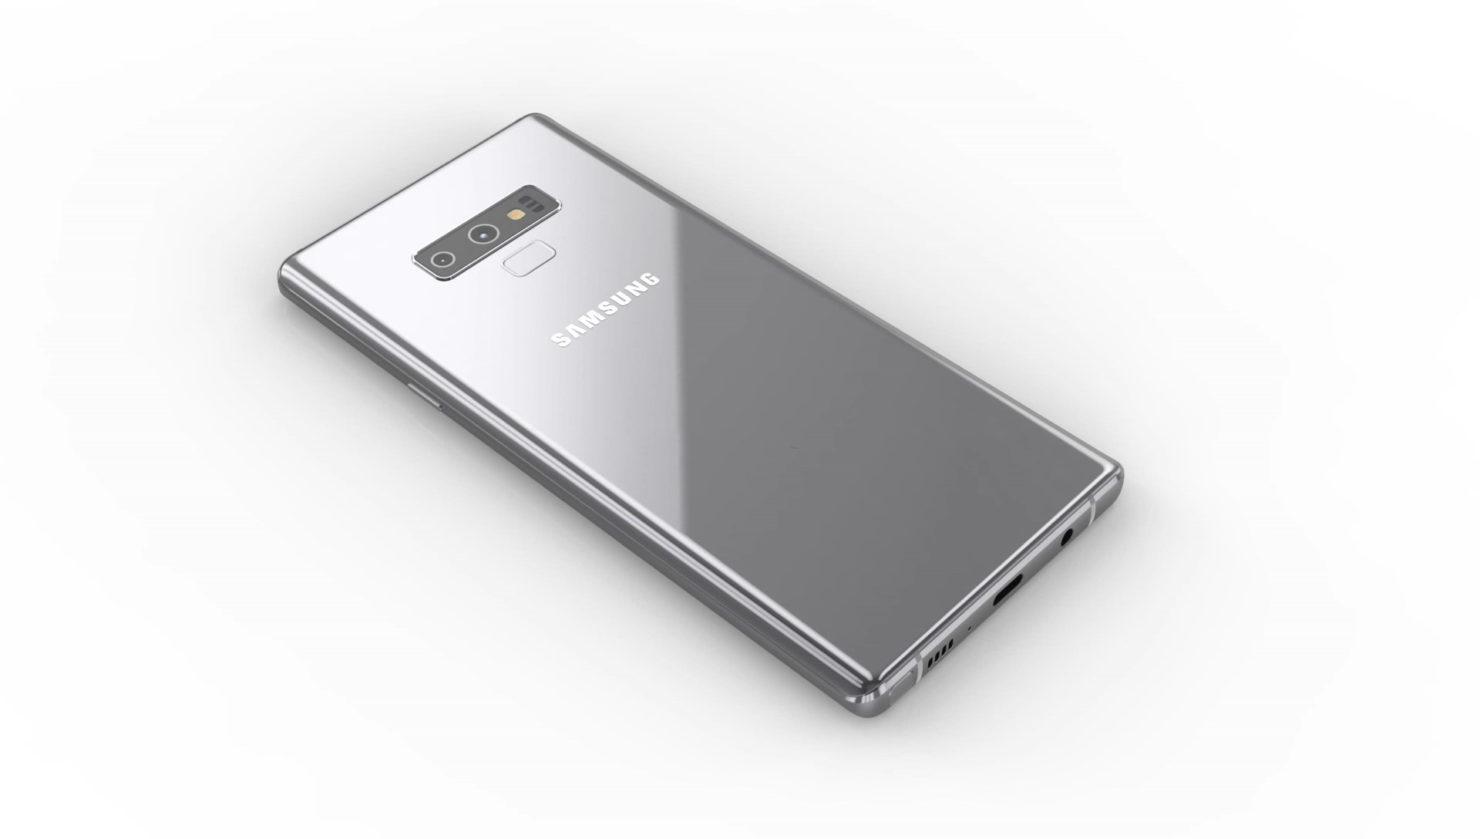 Galaxy Note 9 camera orientation undecided